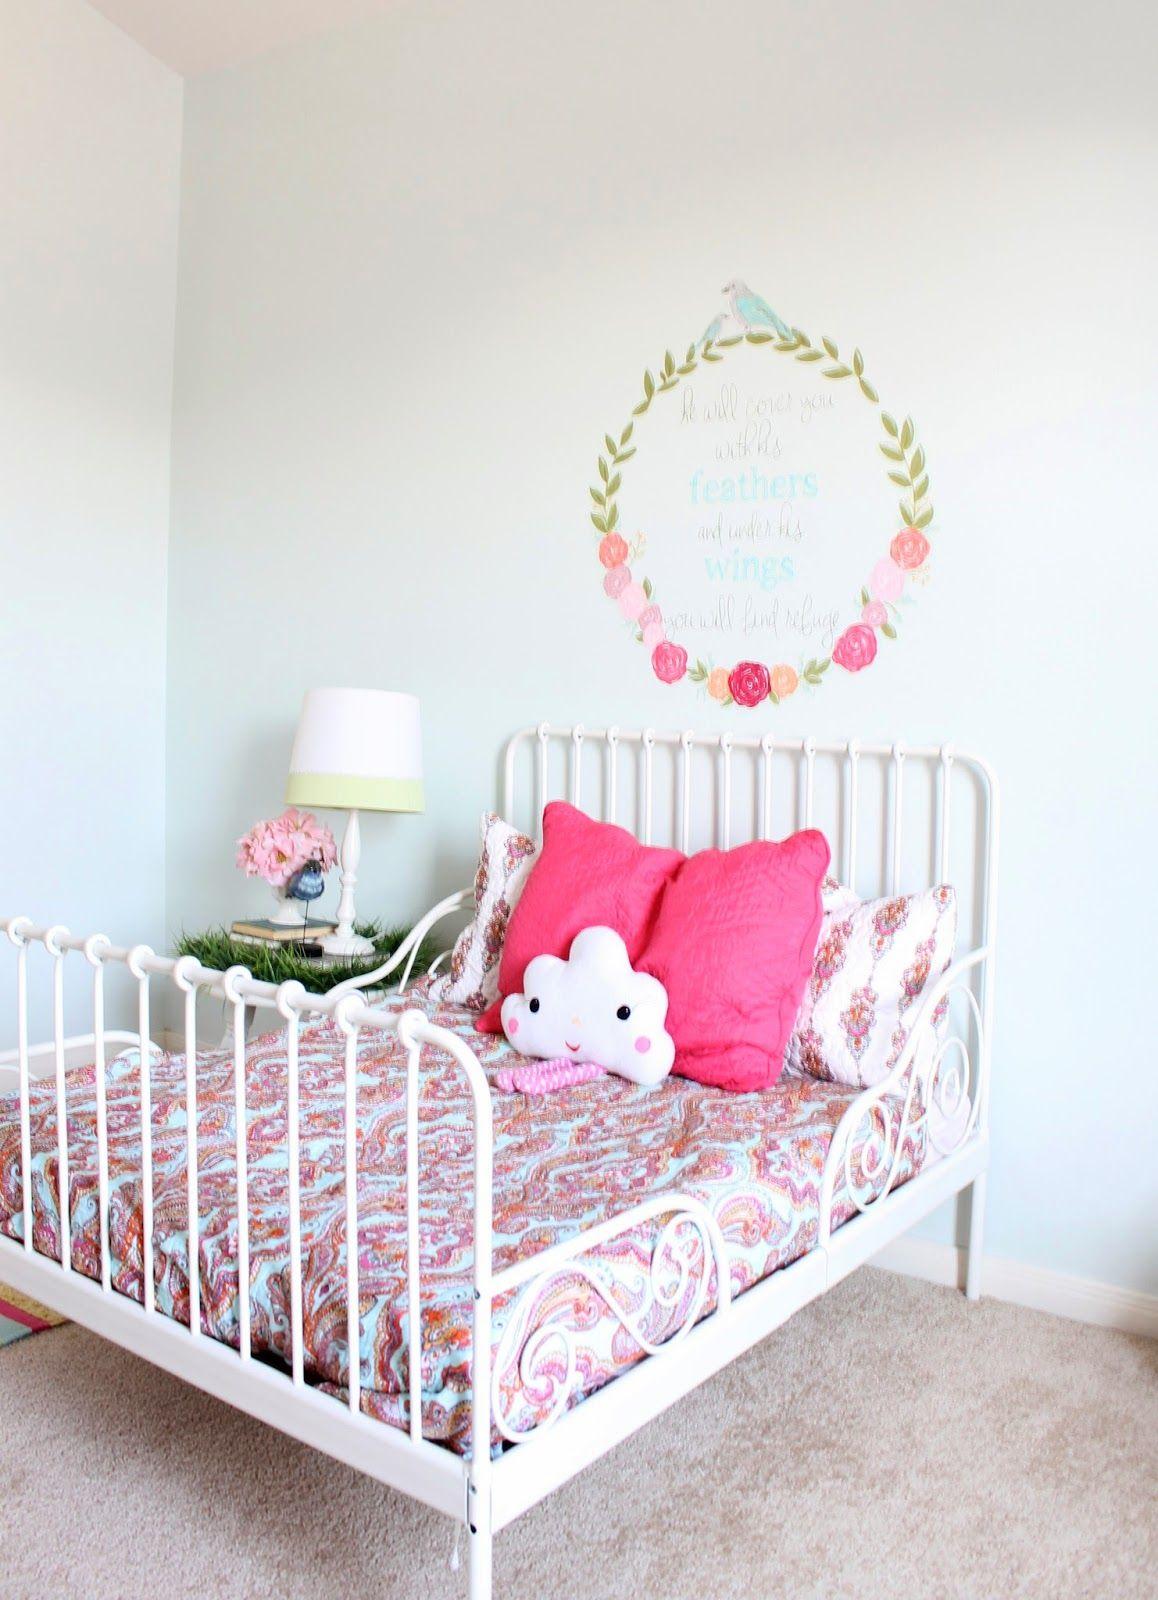 The Ragged Wren Girls Room MakeoverFinally